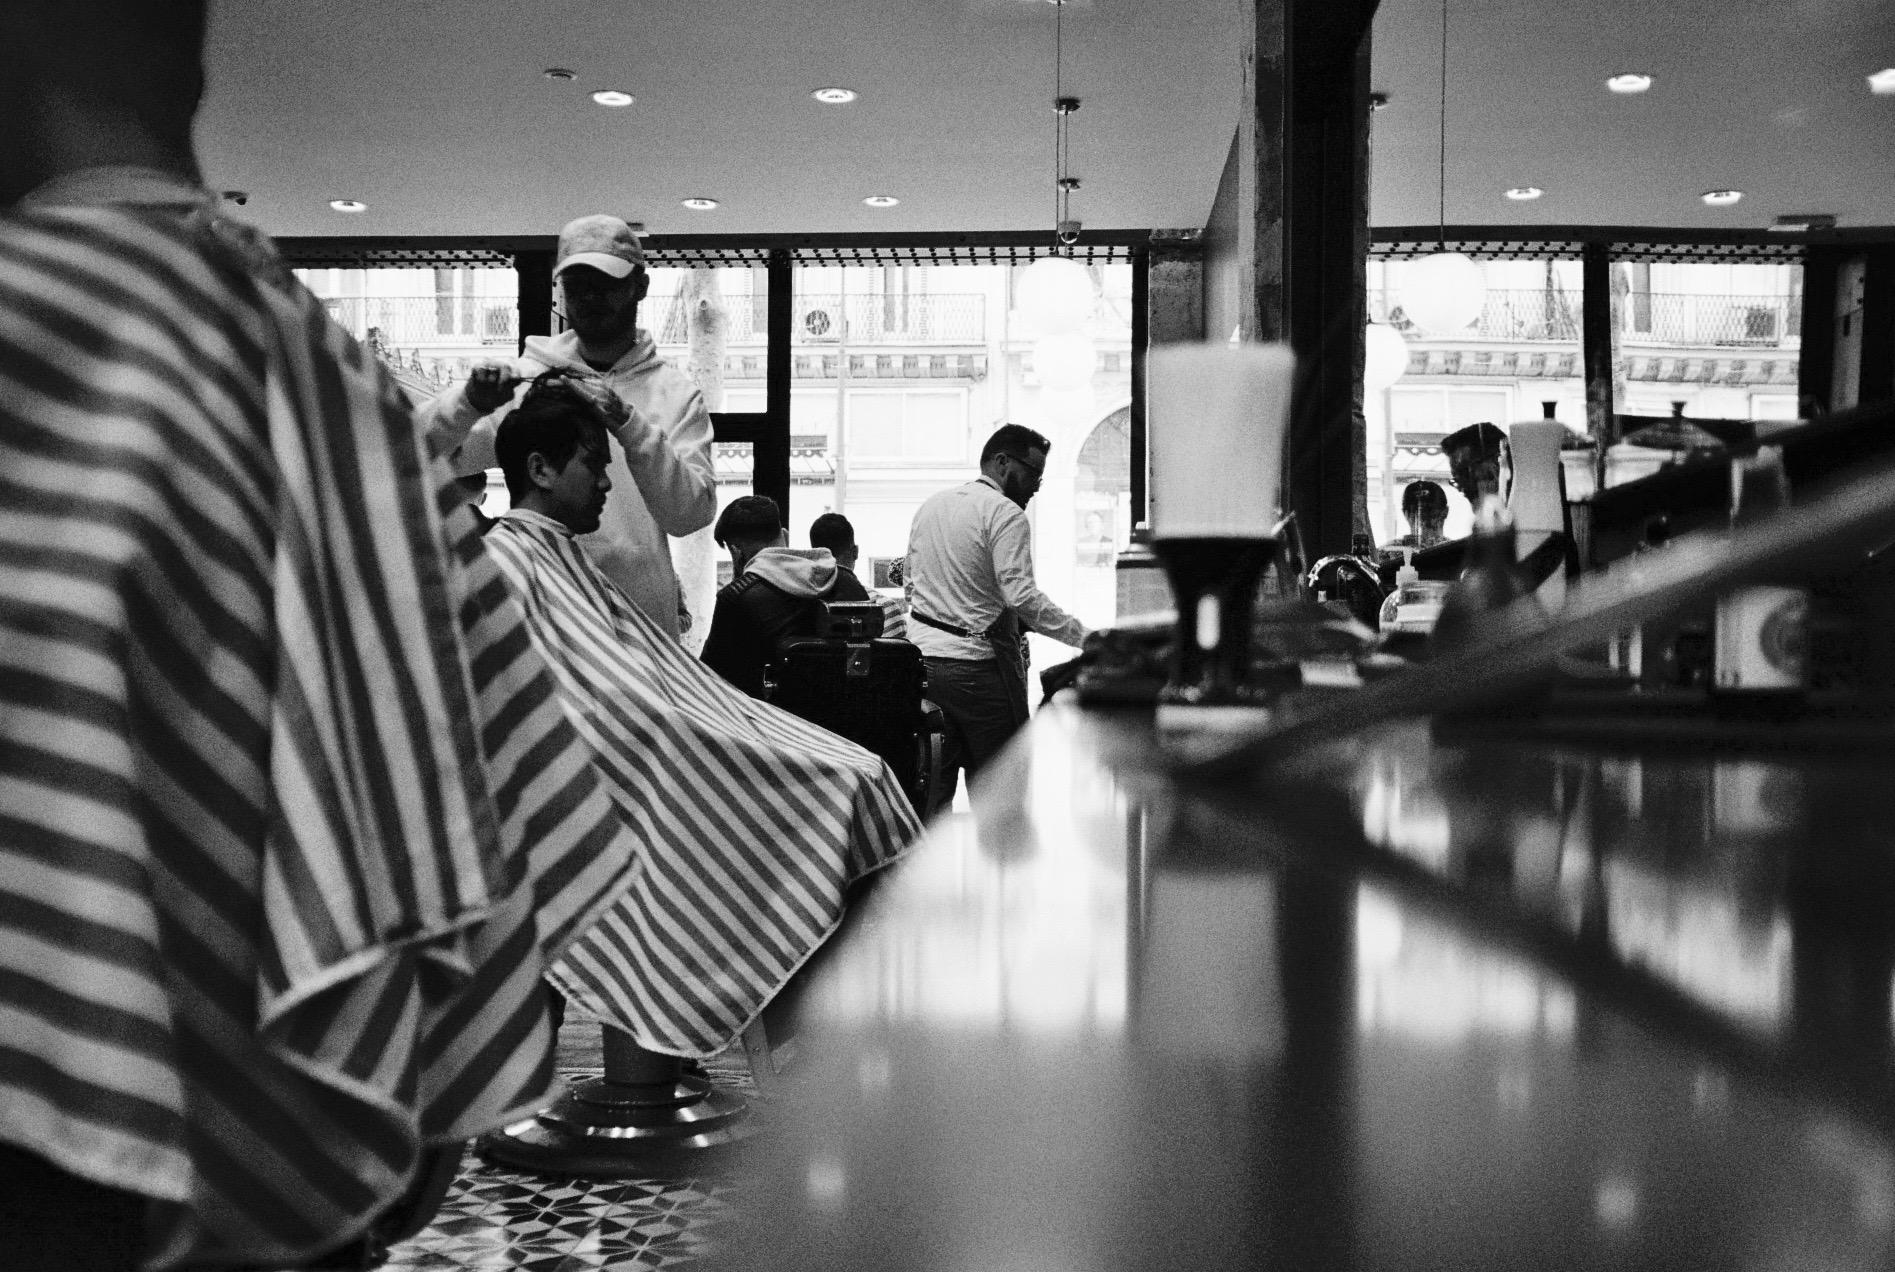 Les Garçons Barbiers old school Barber